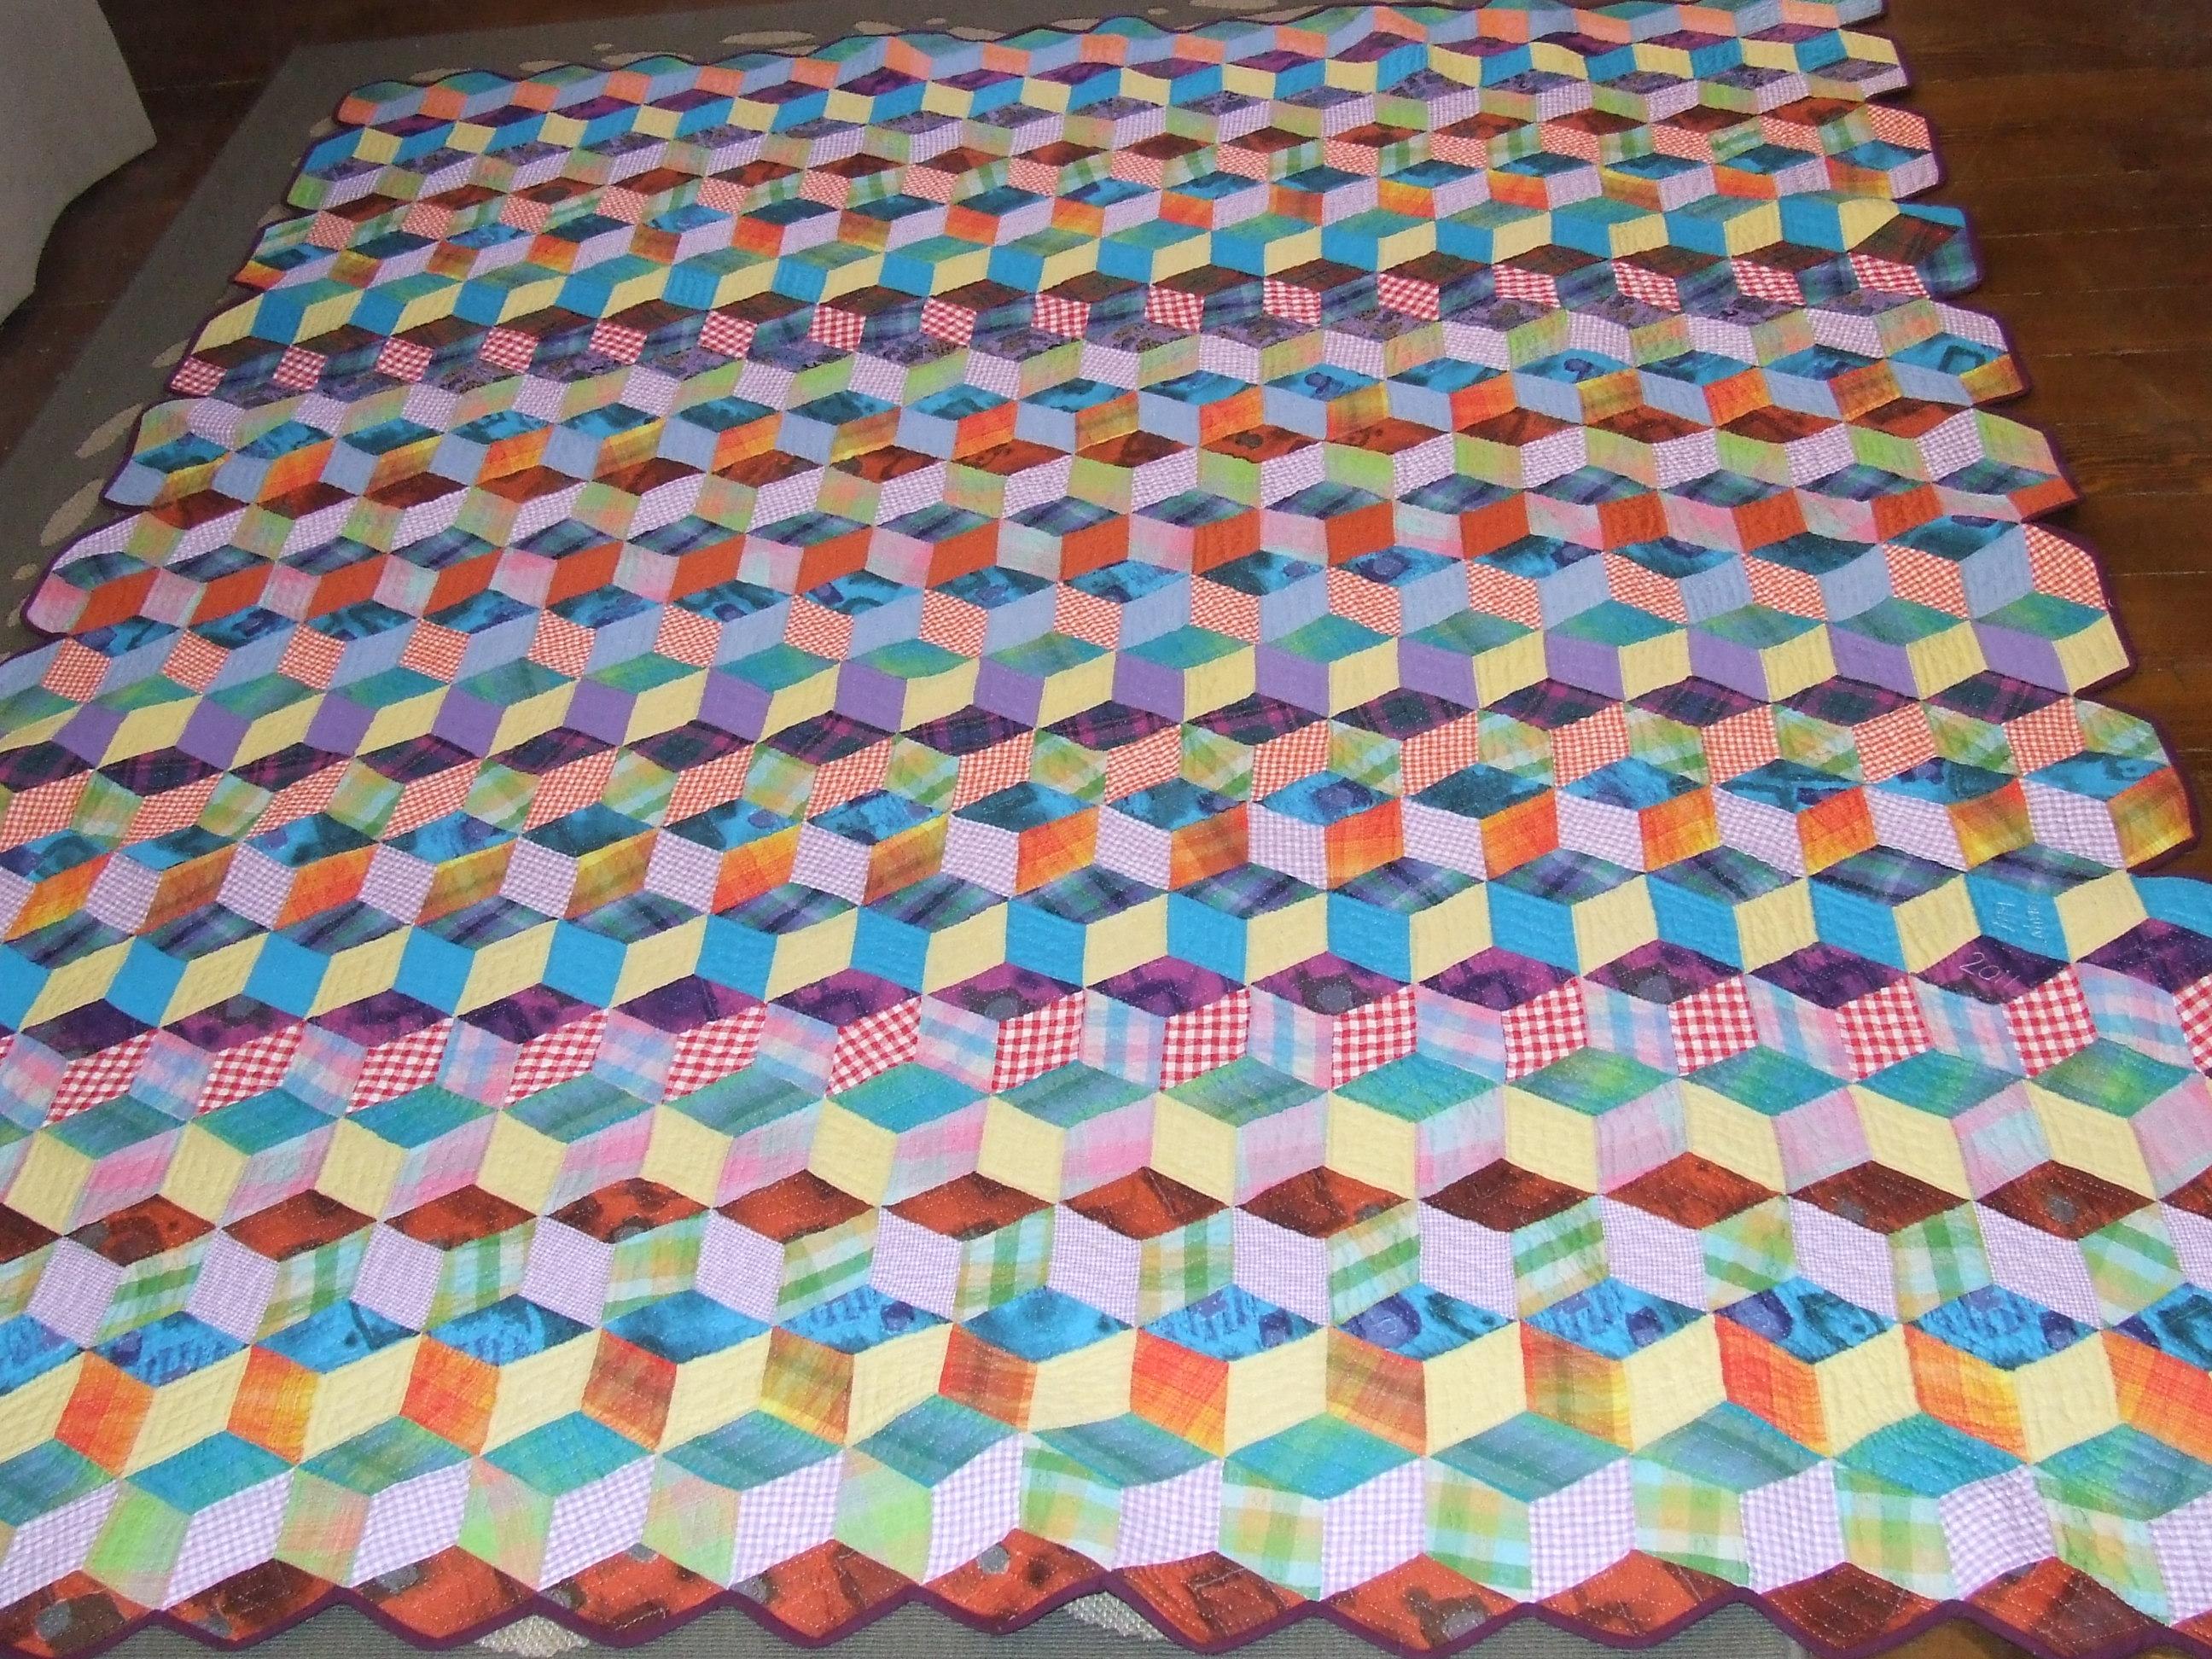 Tumbling Blocks Crochet Pattern Miifotos